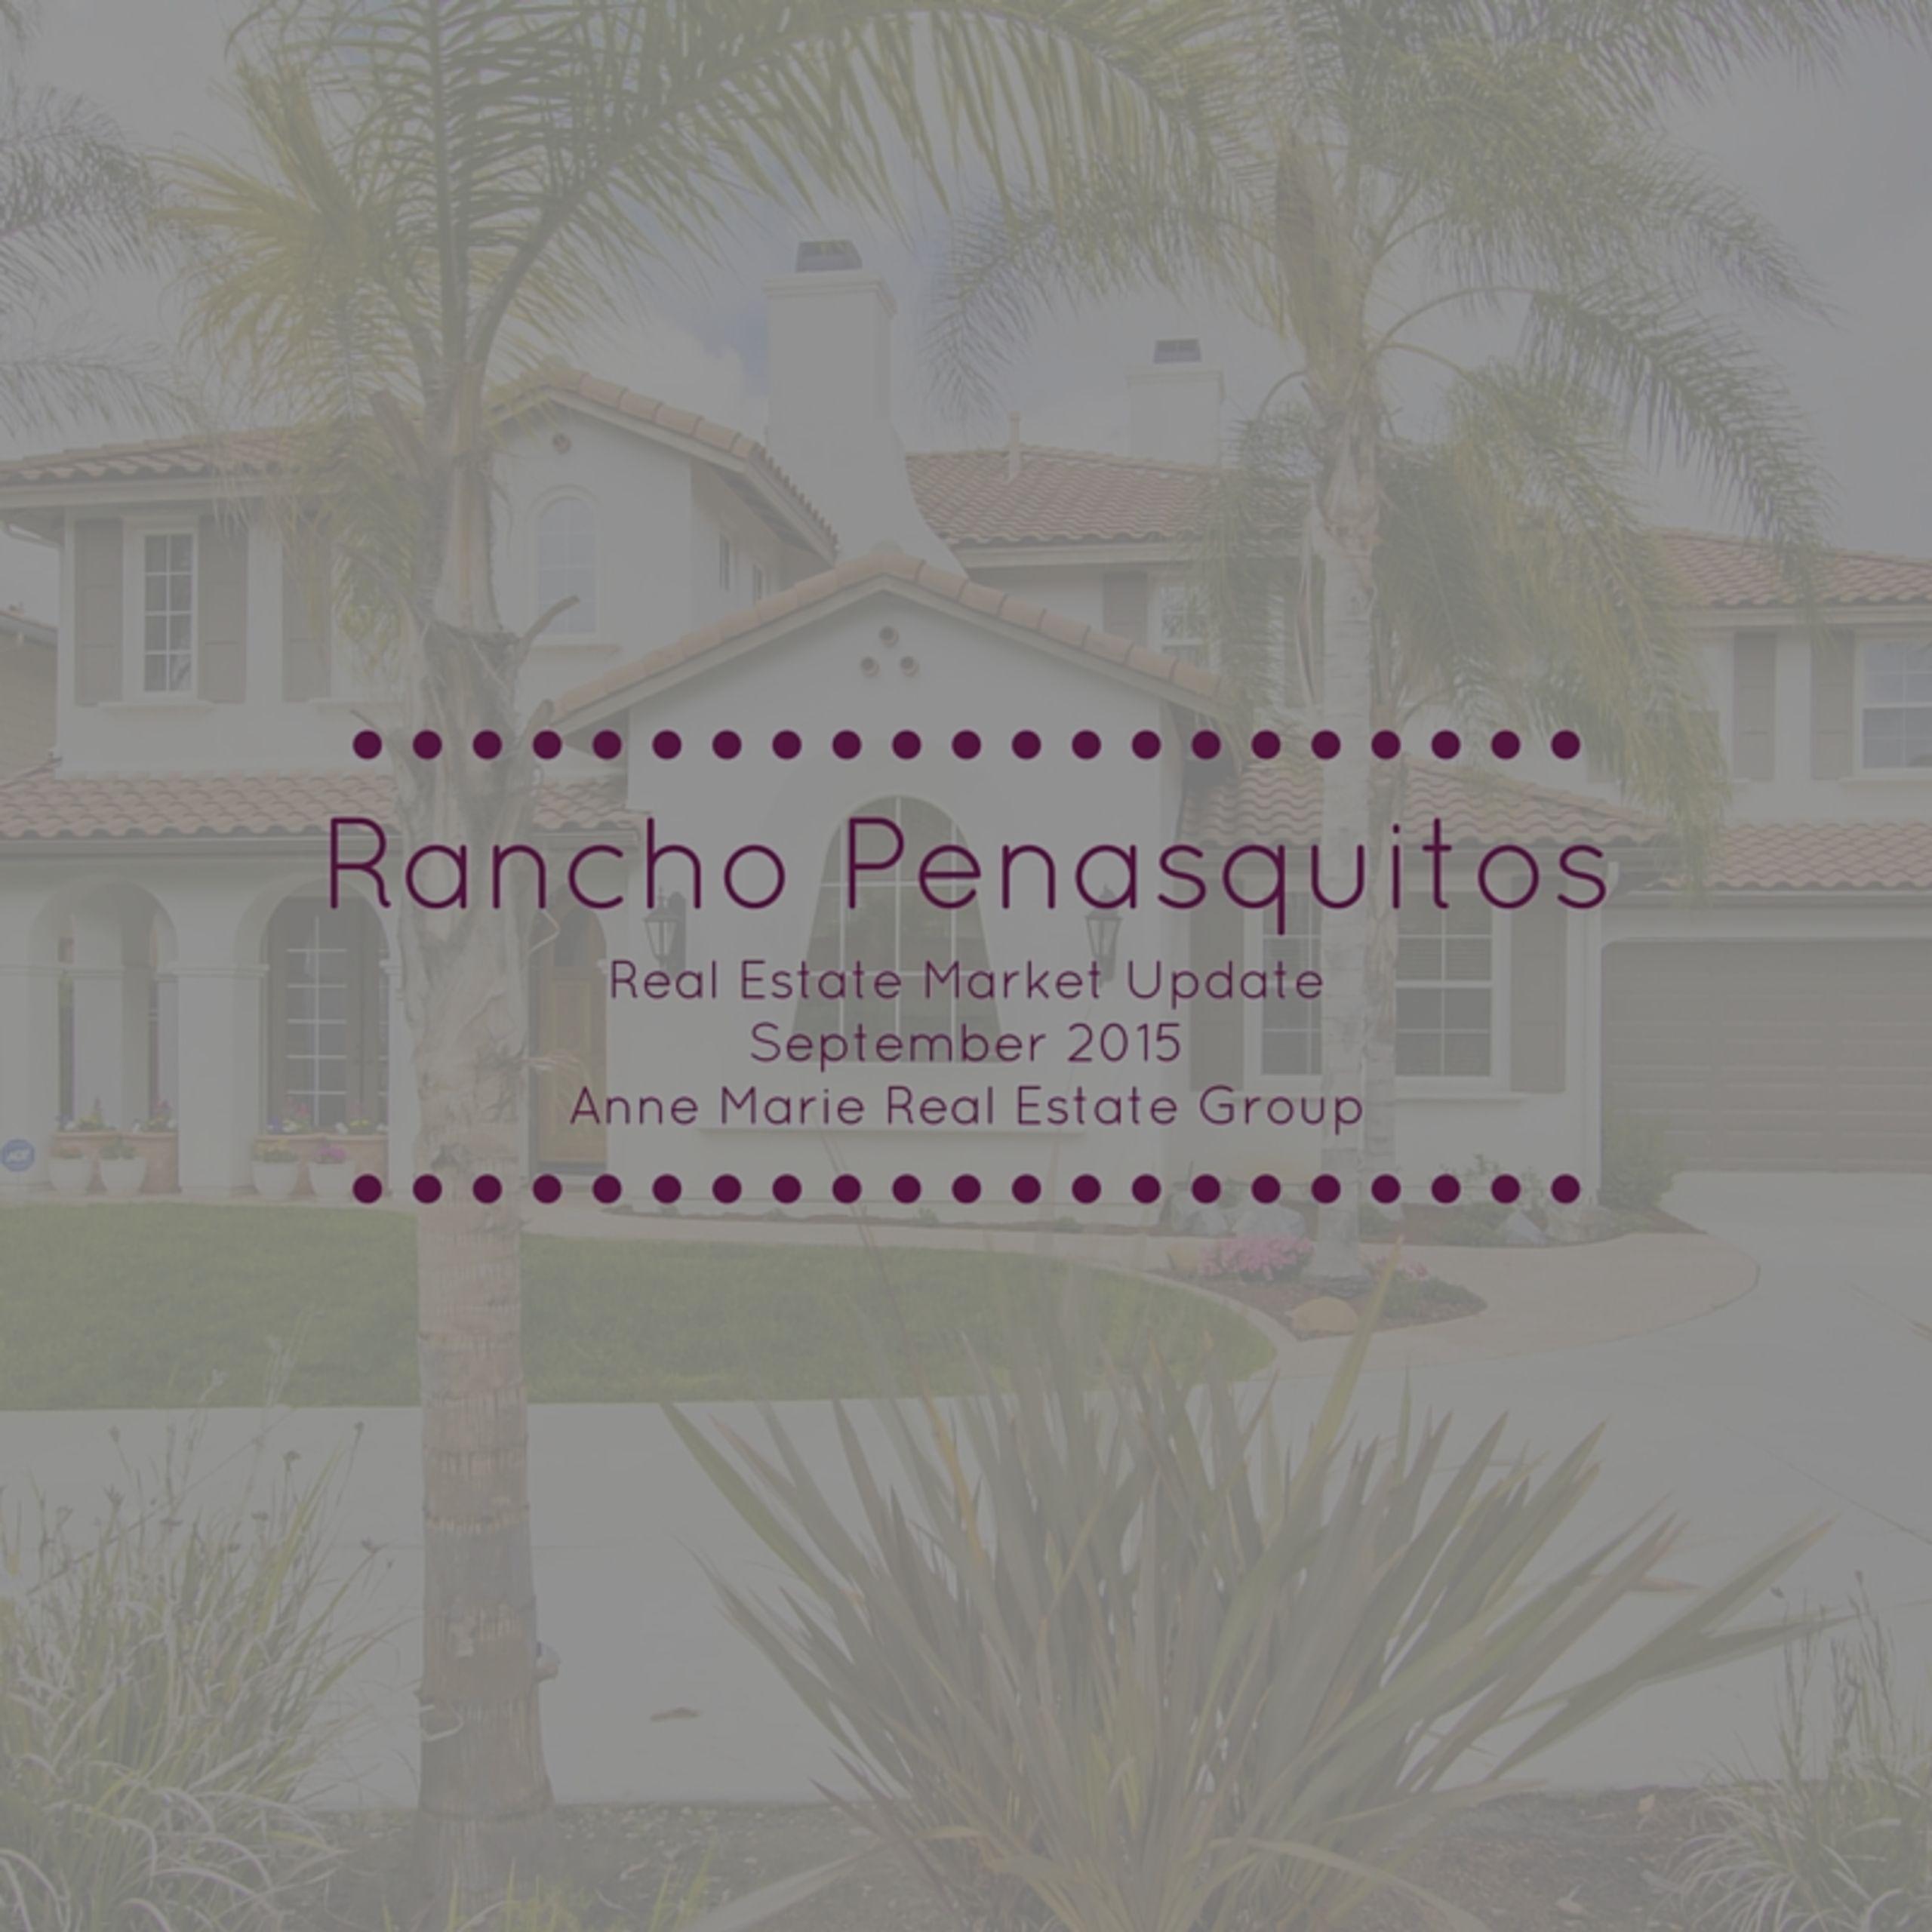 Rancho Penasquitos 92129 Real Estate Market Update September 2015